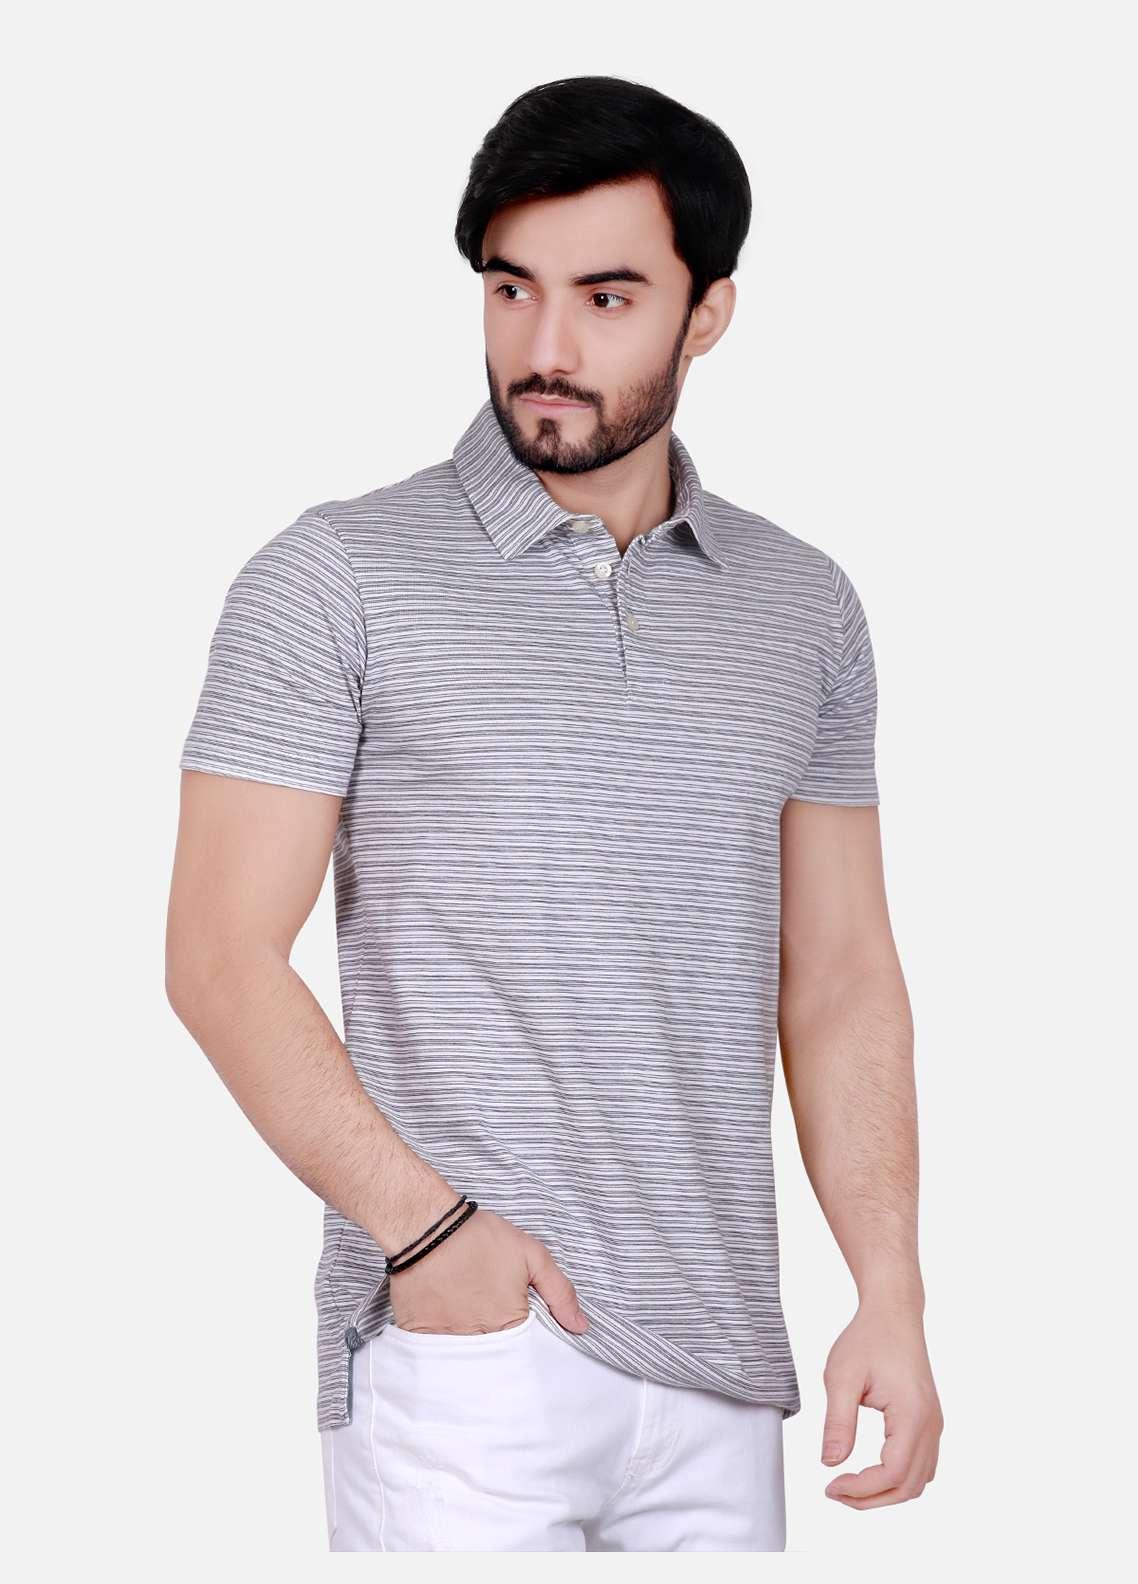 Furor Cotton Polo Men T-Shirts - Grey FRM18PS 014